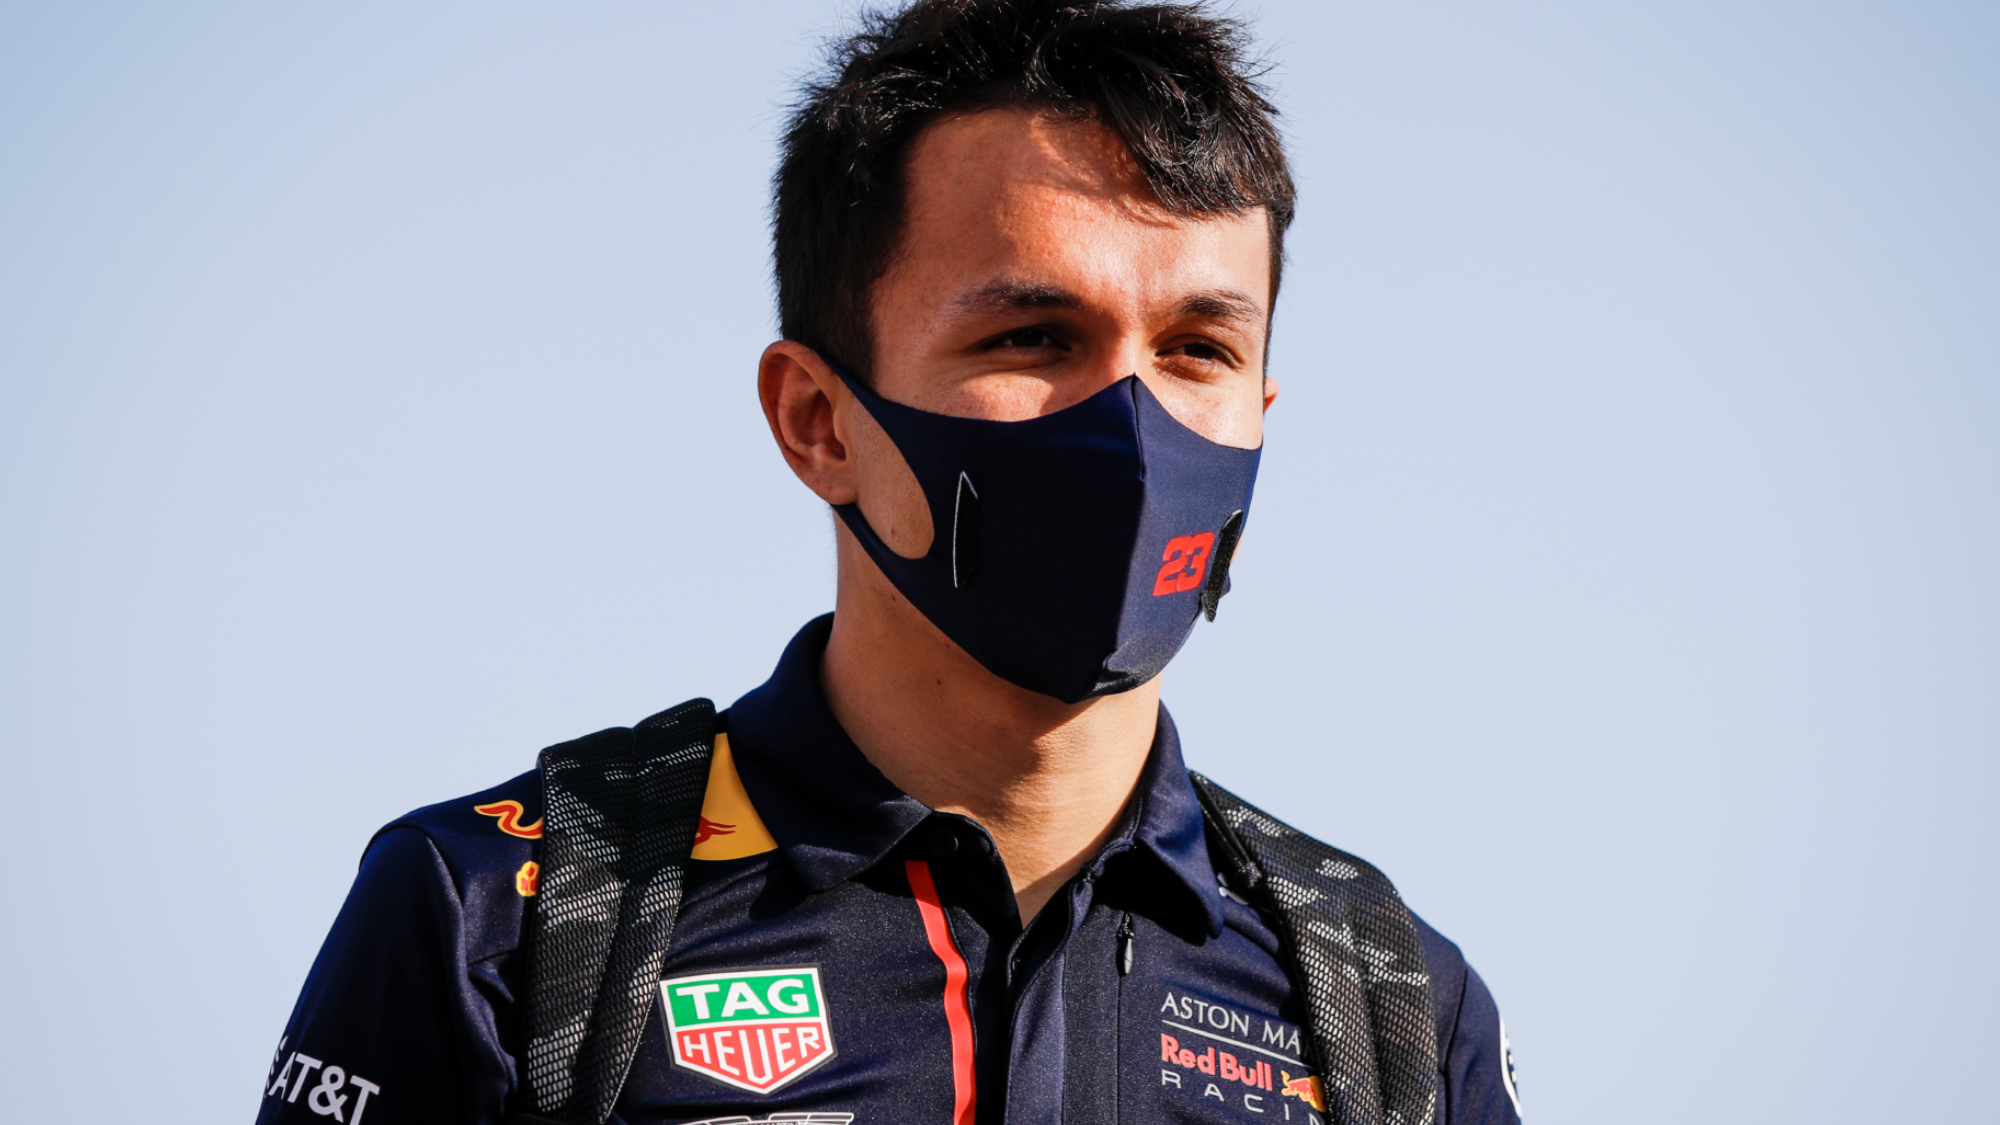 Albon to race DTM in 2021 alongside Red Bull F1 reserve role